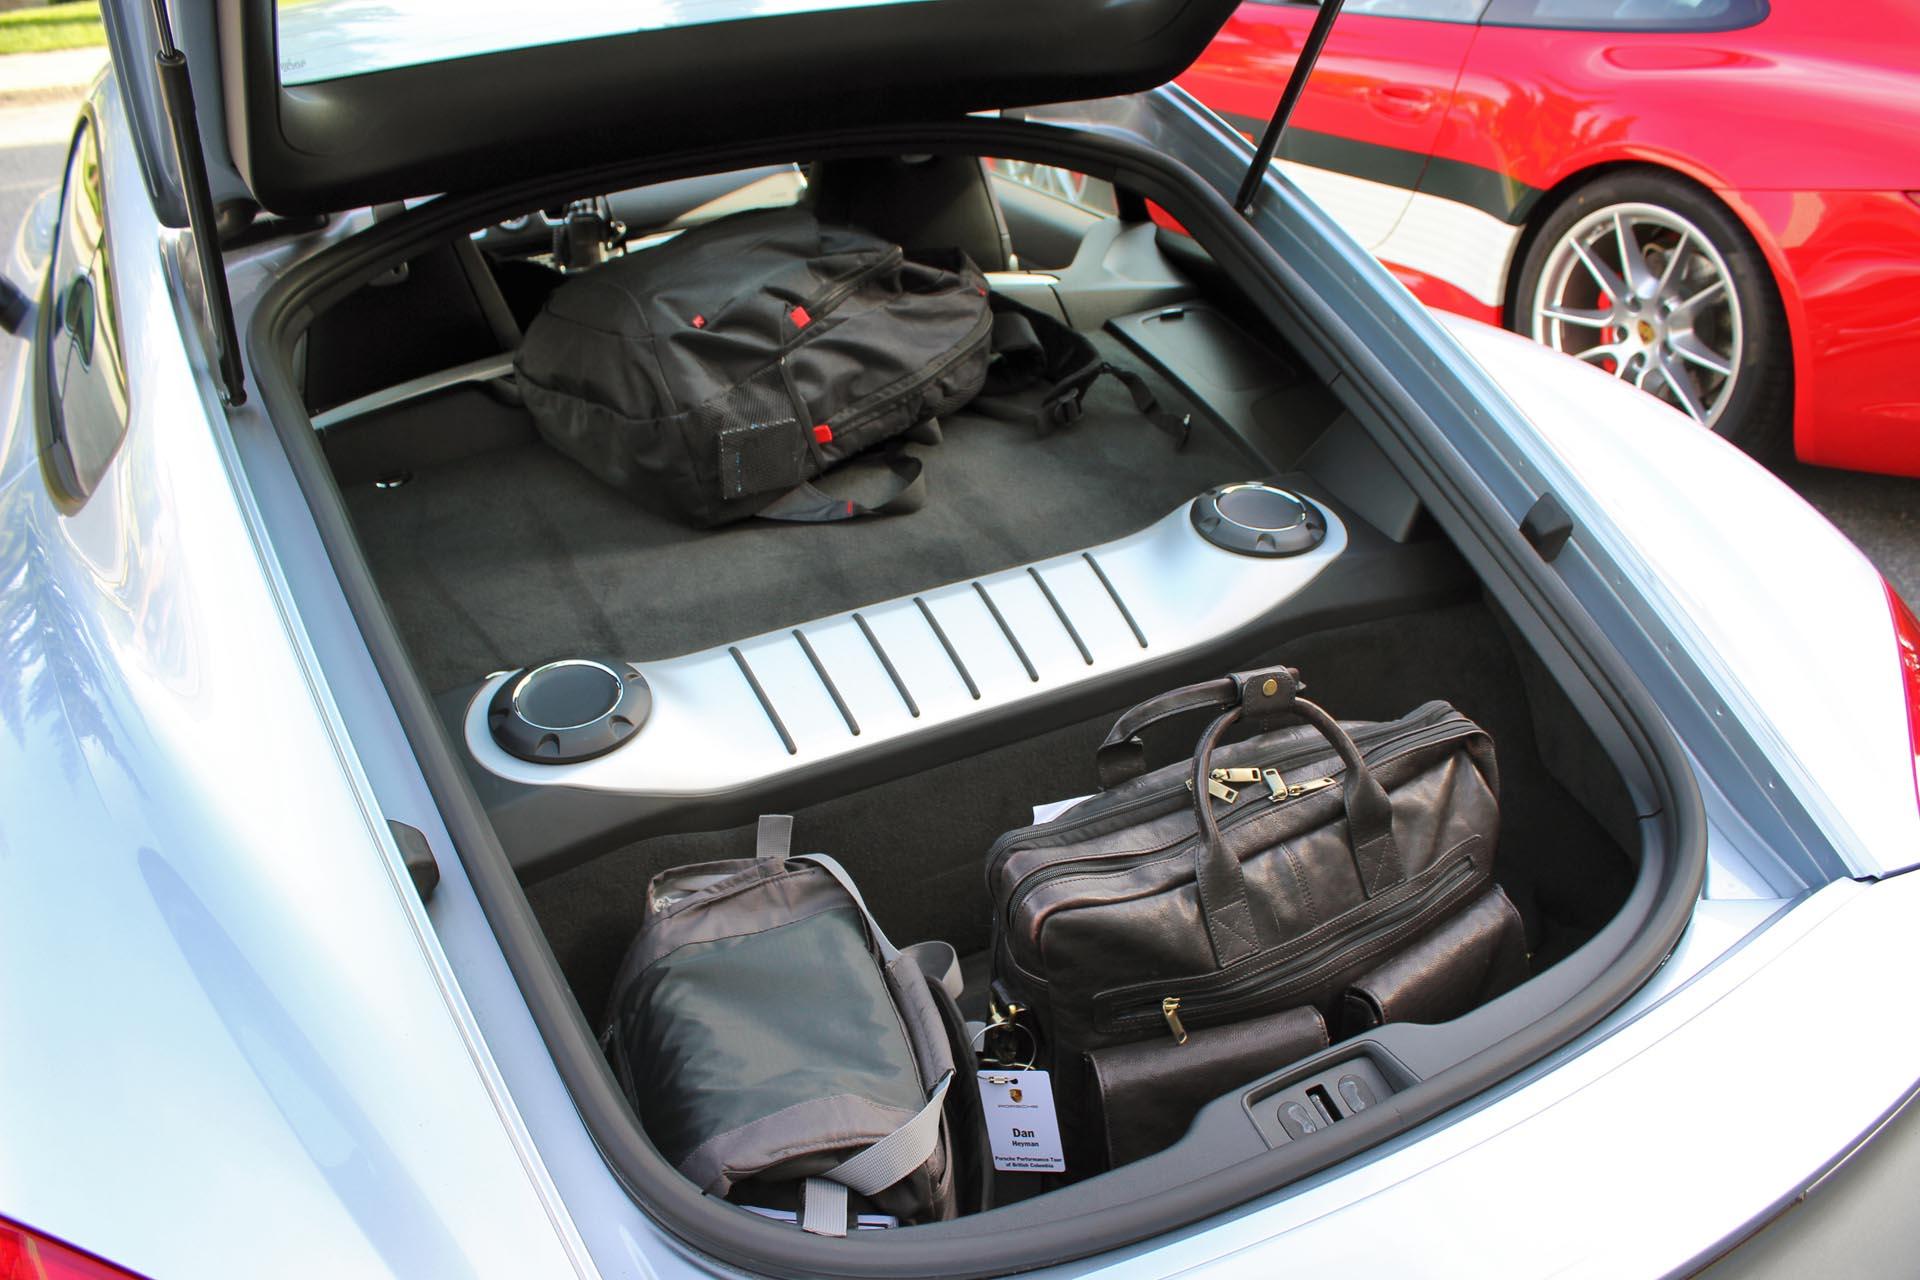 2008 Mazda Cx 9 Engine >> 2015 Porsche Cayman S - Autos.ca